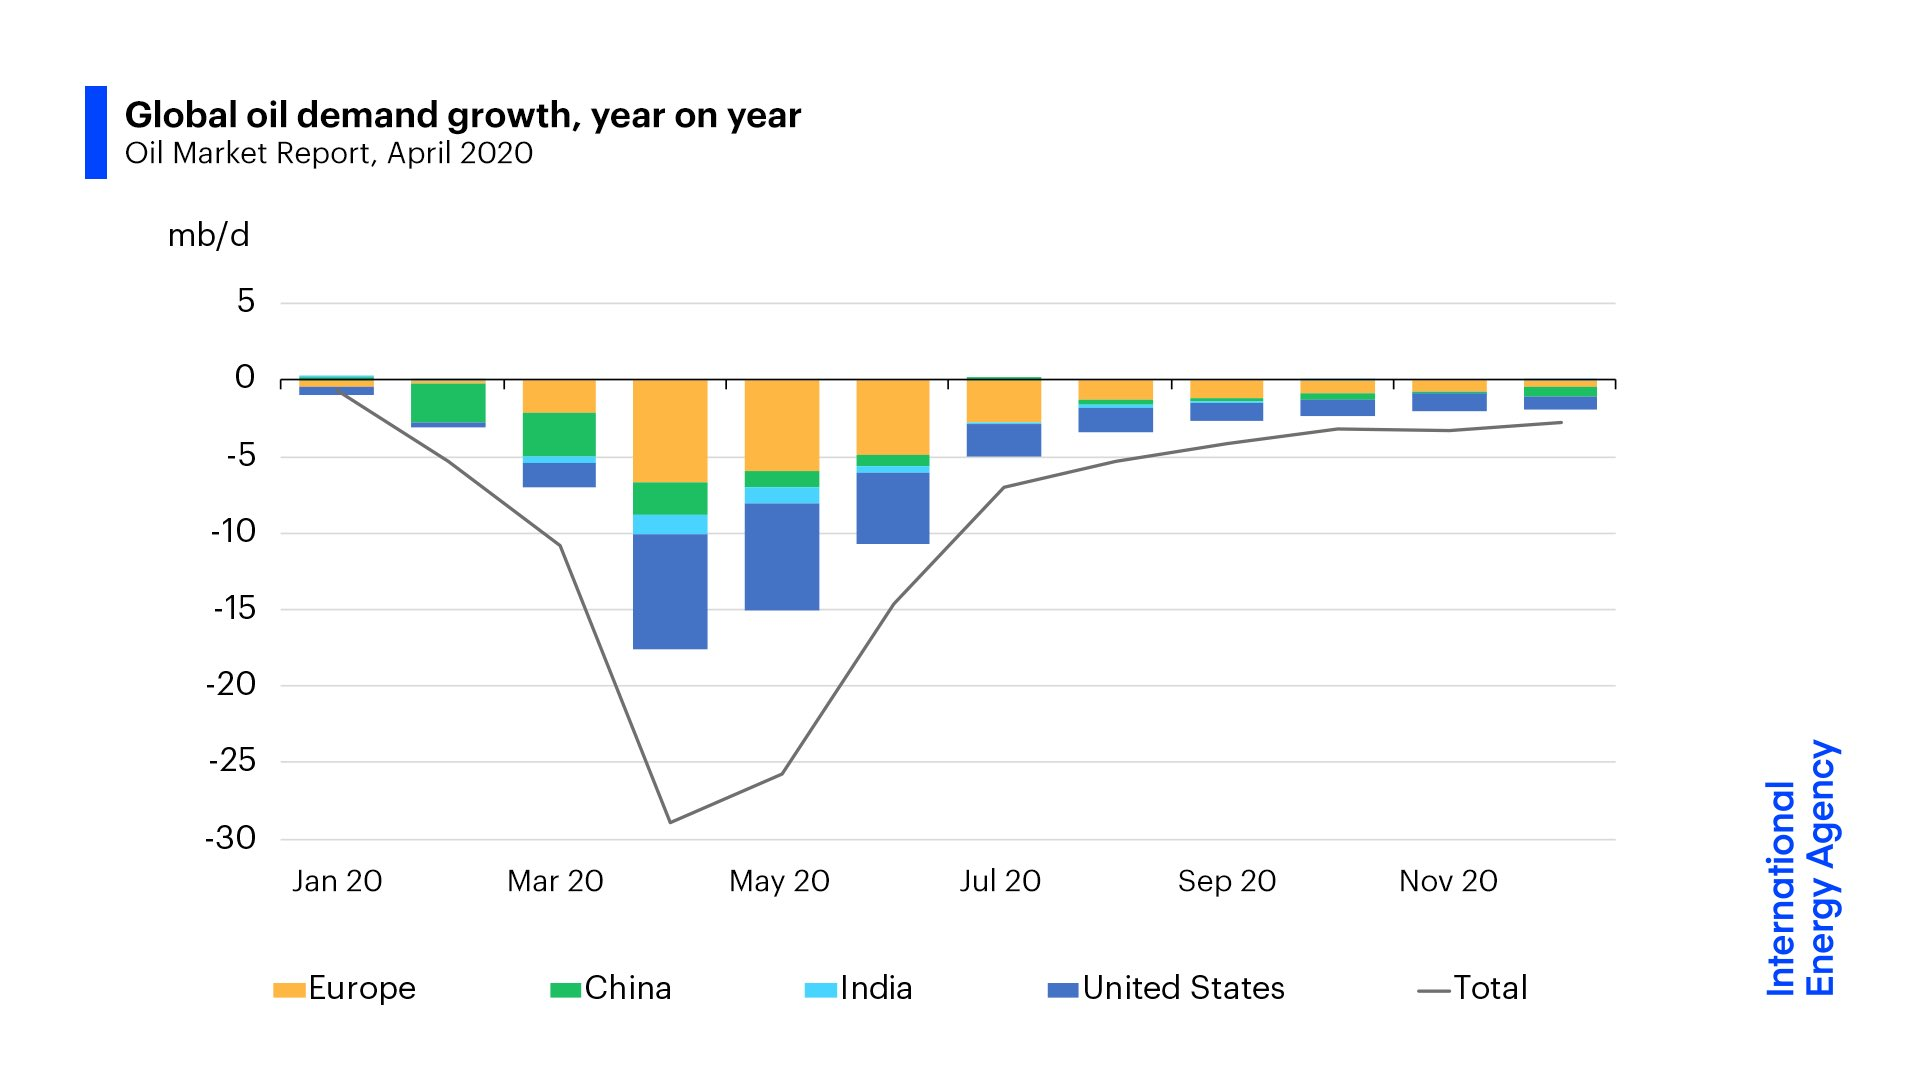 Caída de la demanda de petróleo